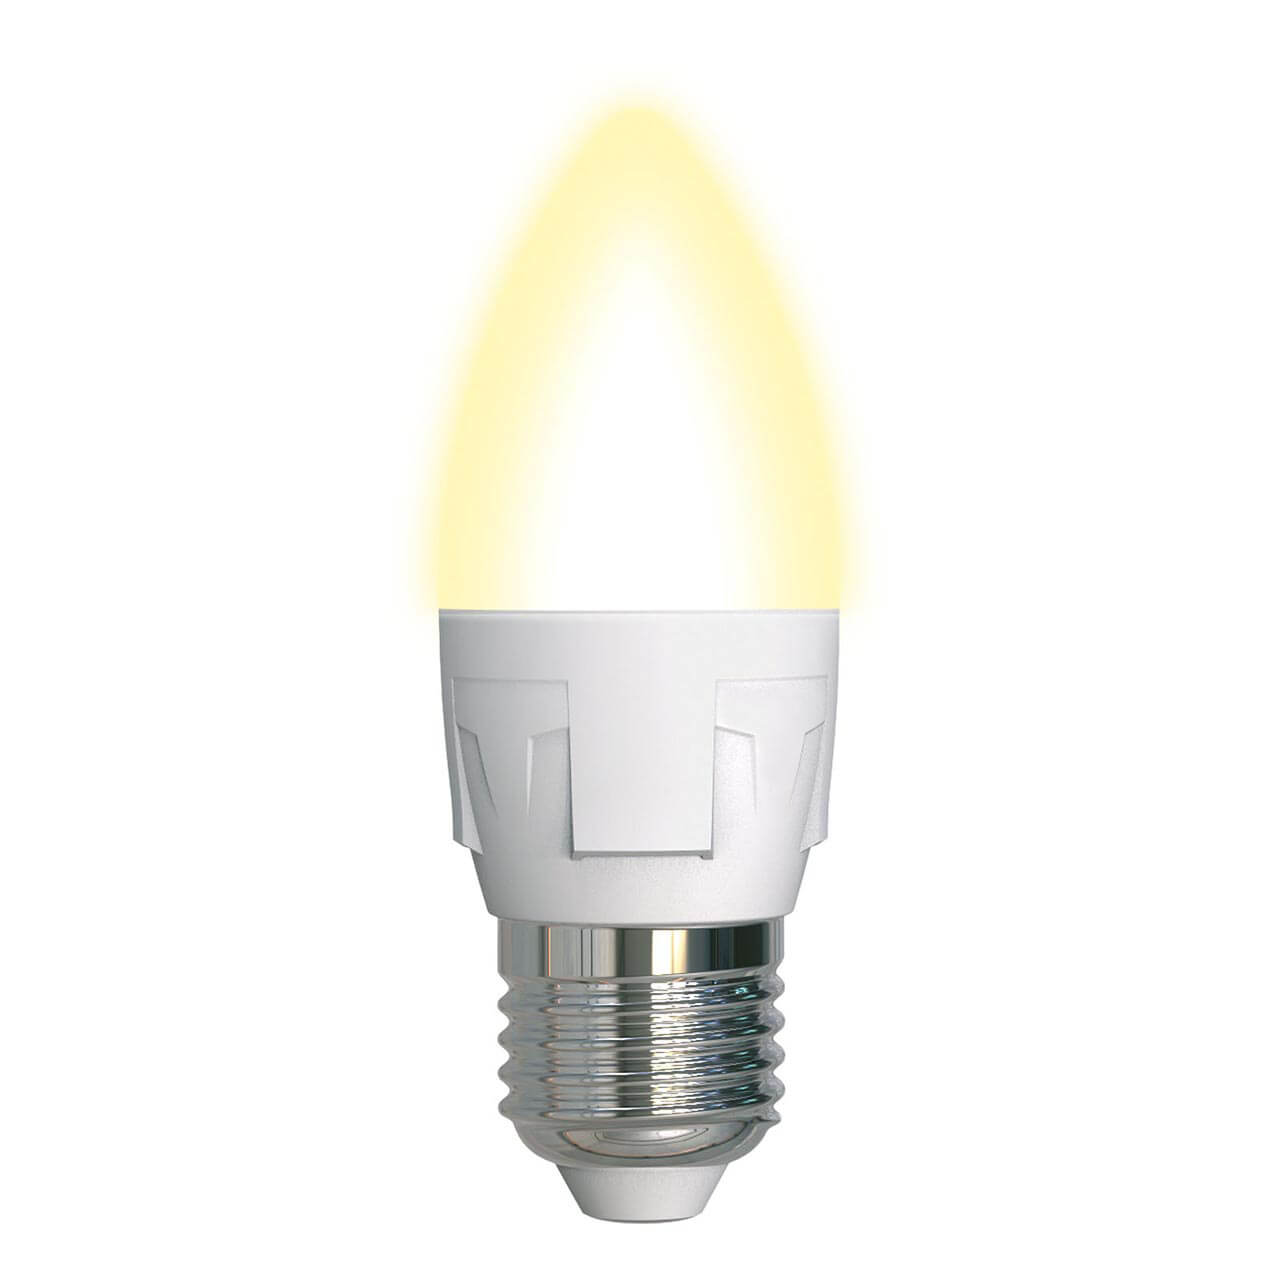 Фото - Лампочка Uniel LED-C37 7W/3000K/E27/FR/DIM PLP01WH Яркая (Диммирование) светодиодная лампа светильник uniel led u270 60w 3000k e27 fr plu01wh